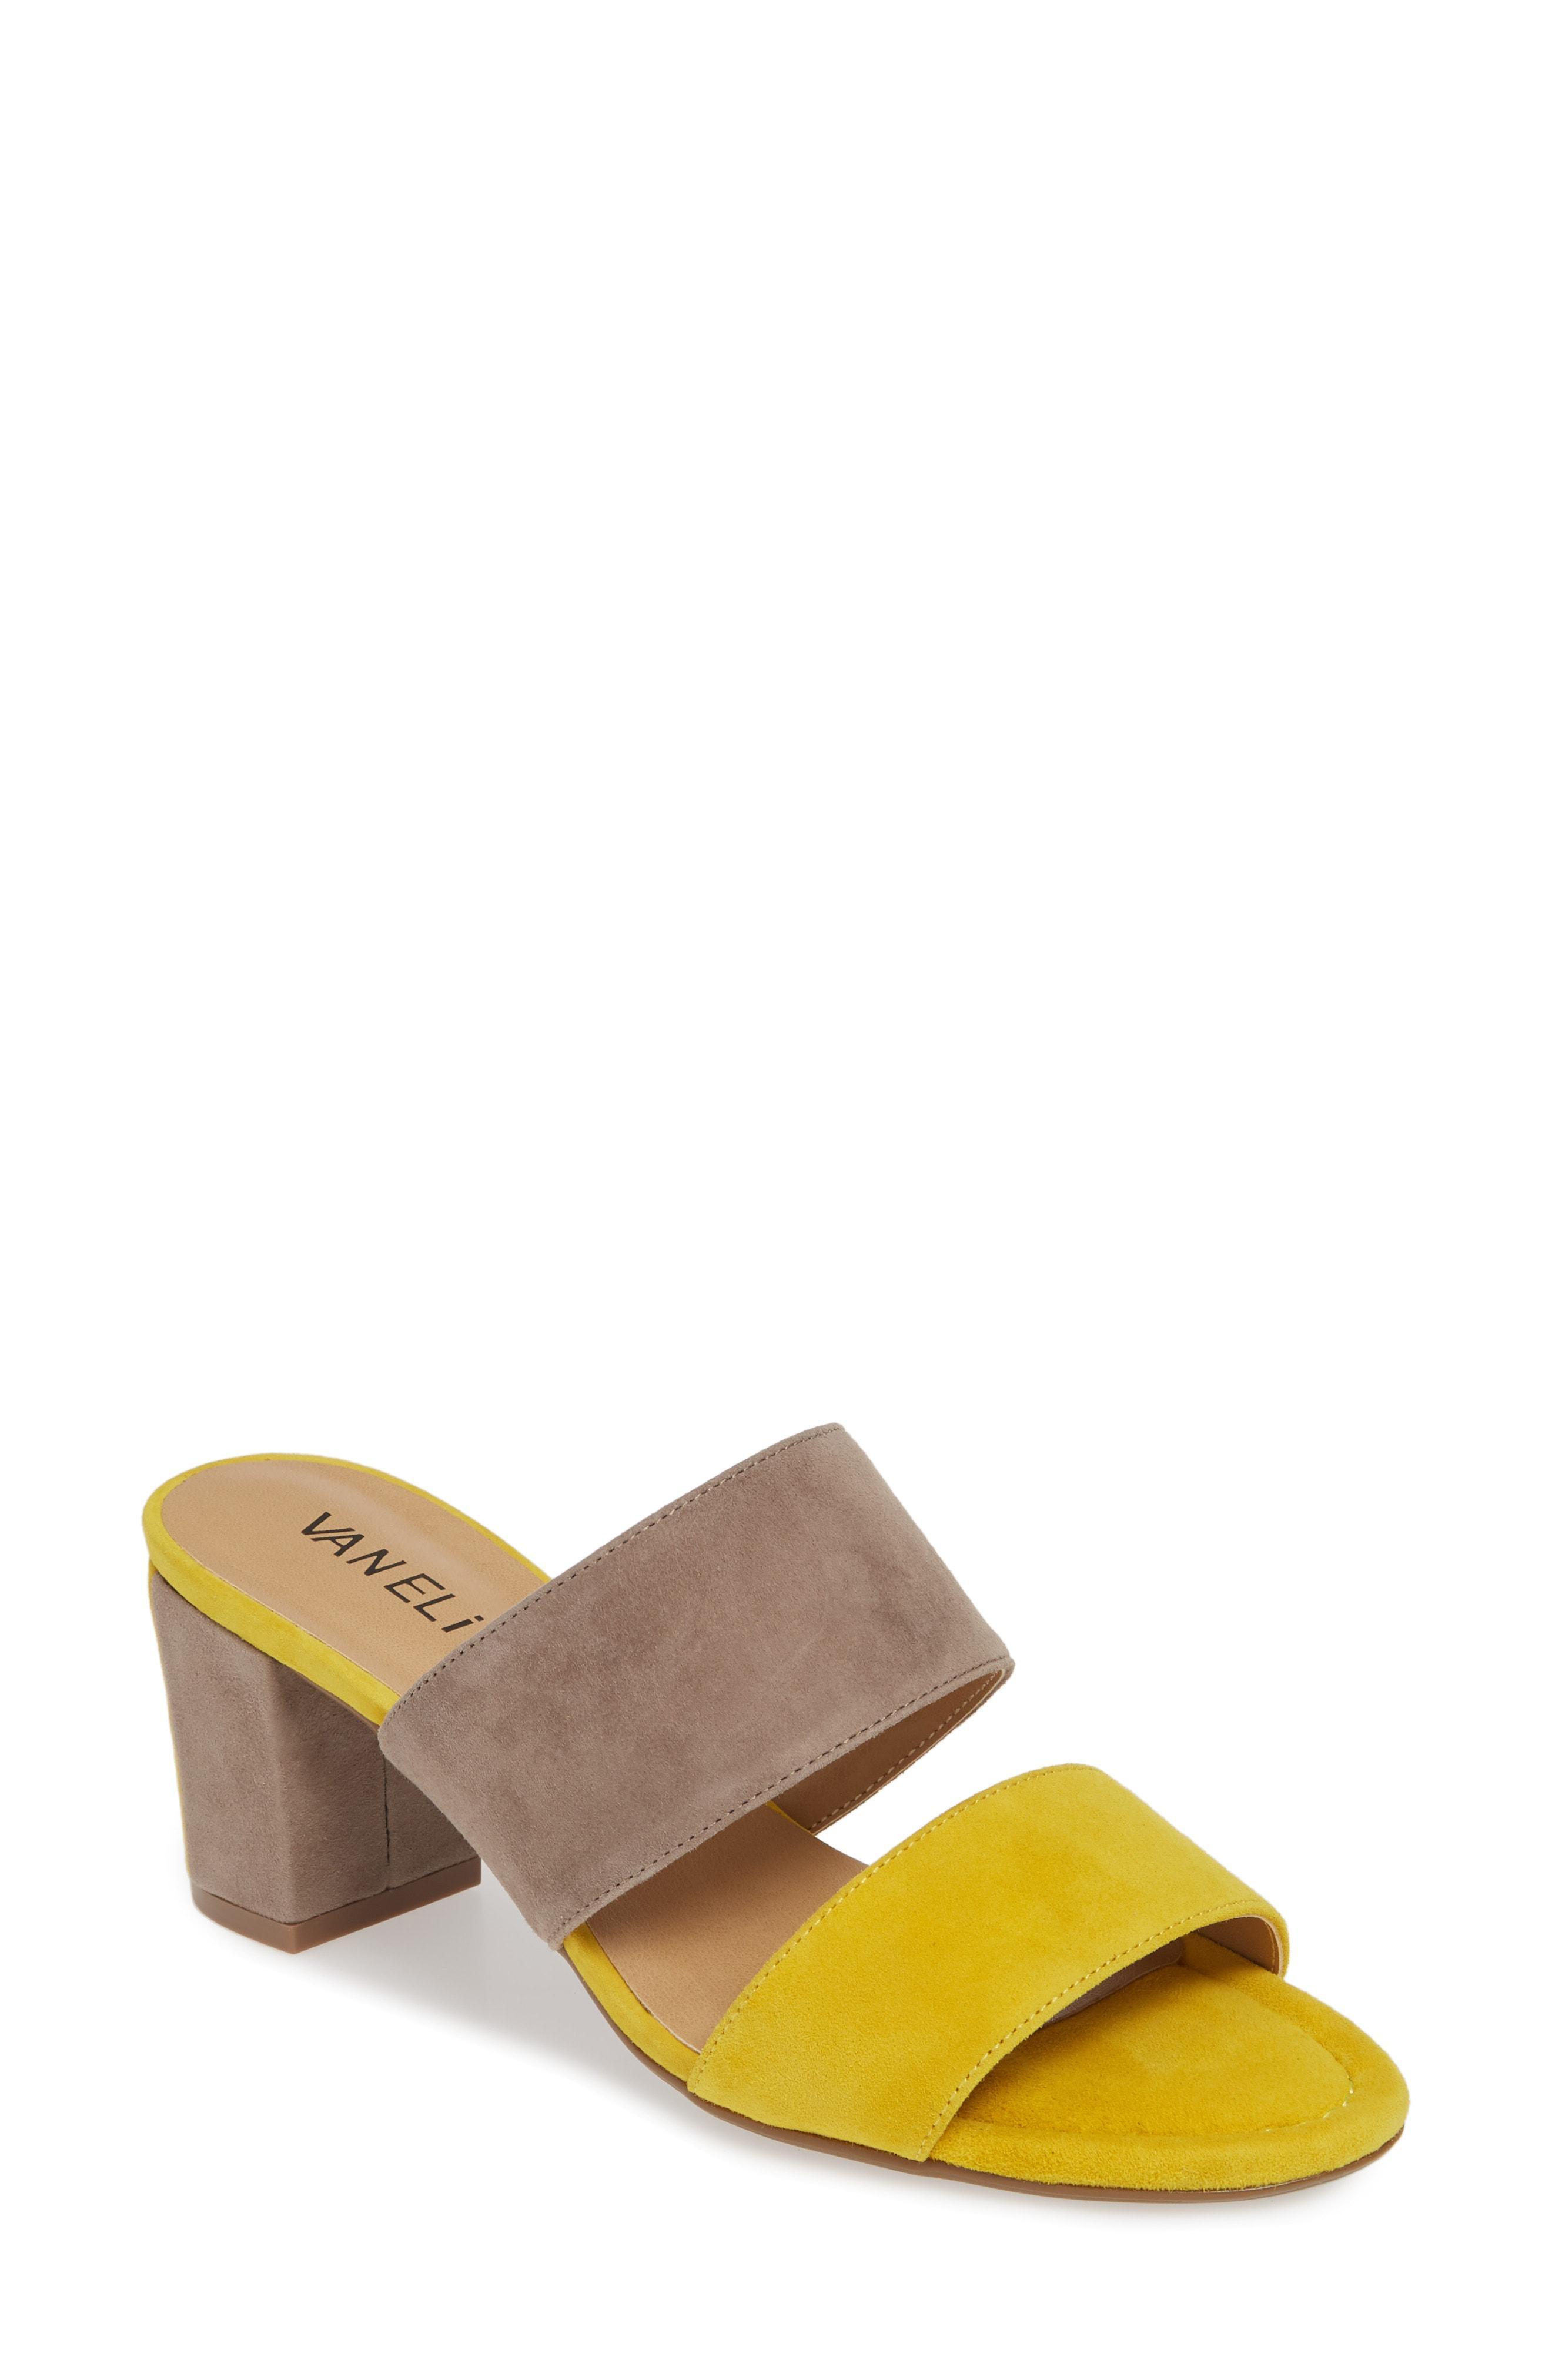 316c11a6253 Lyst - Vaneli Matida Slide Sandal in Brown